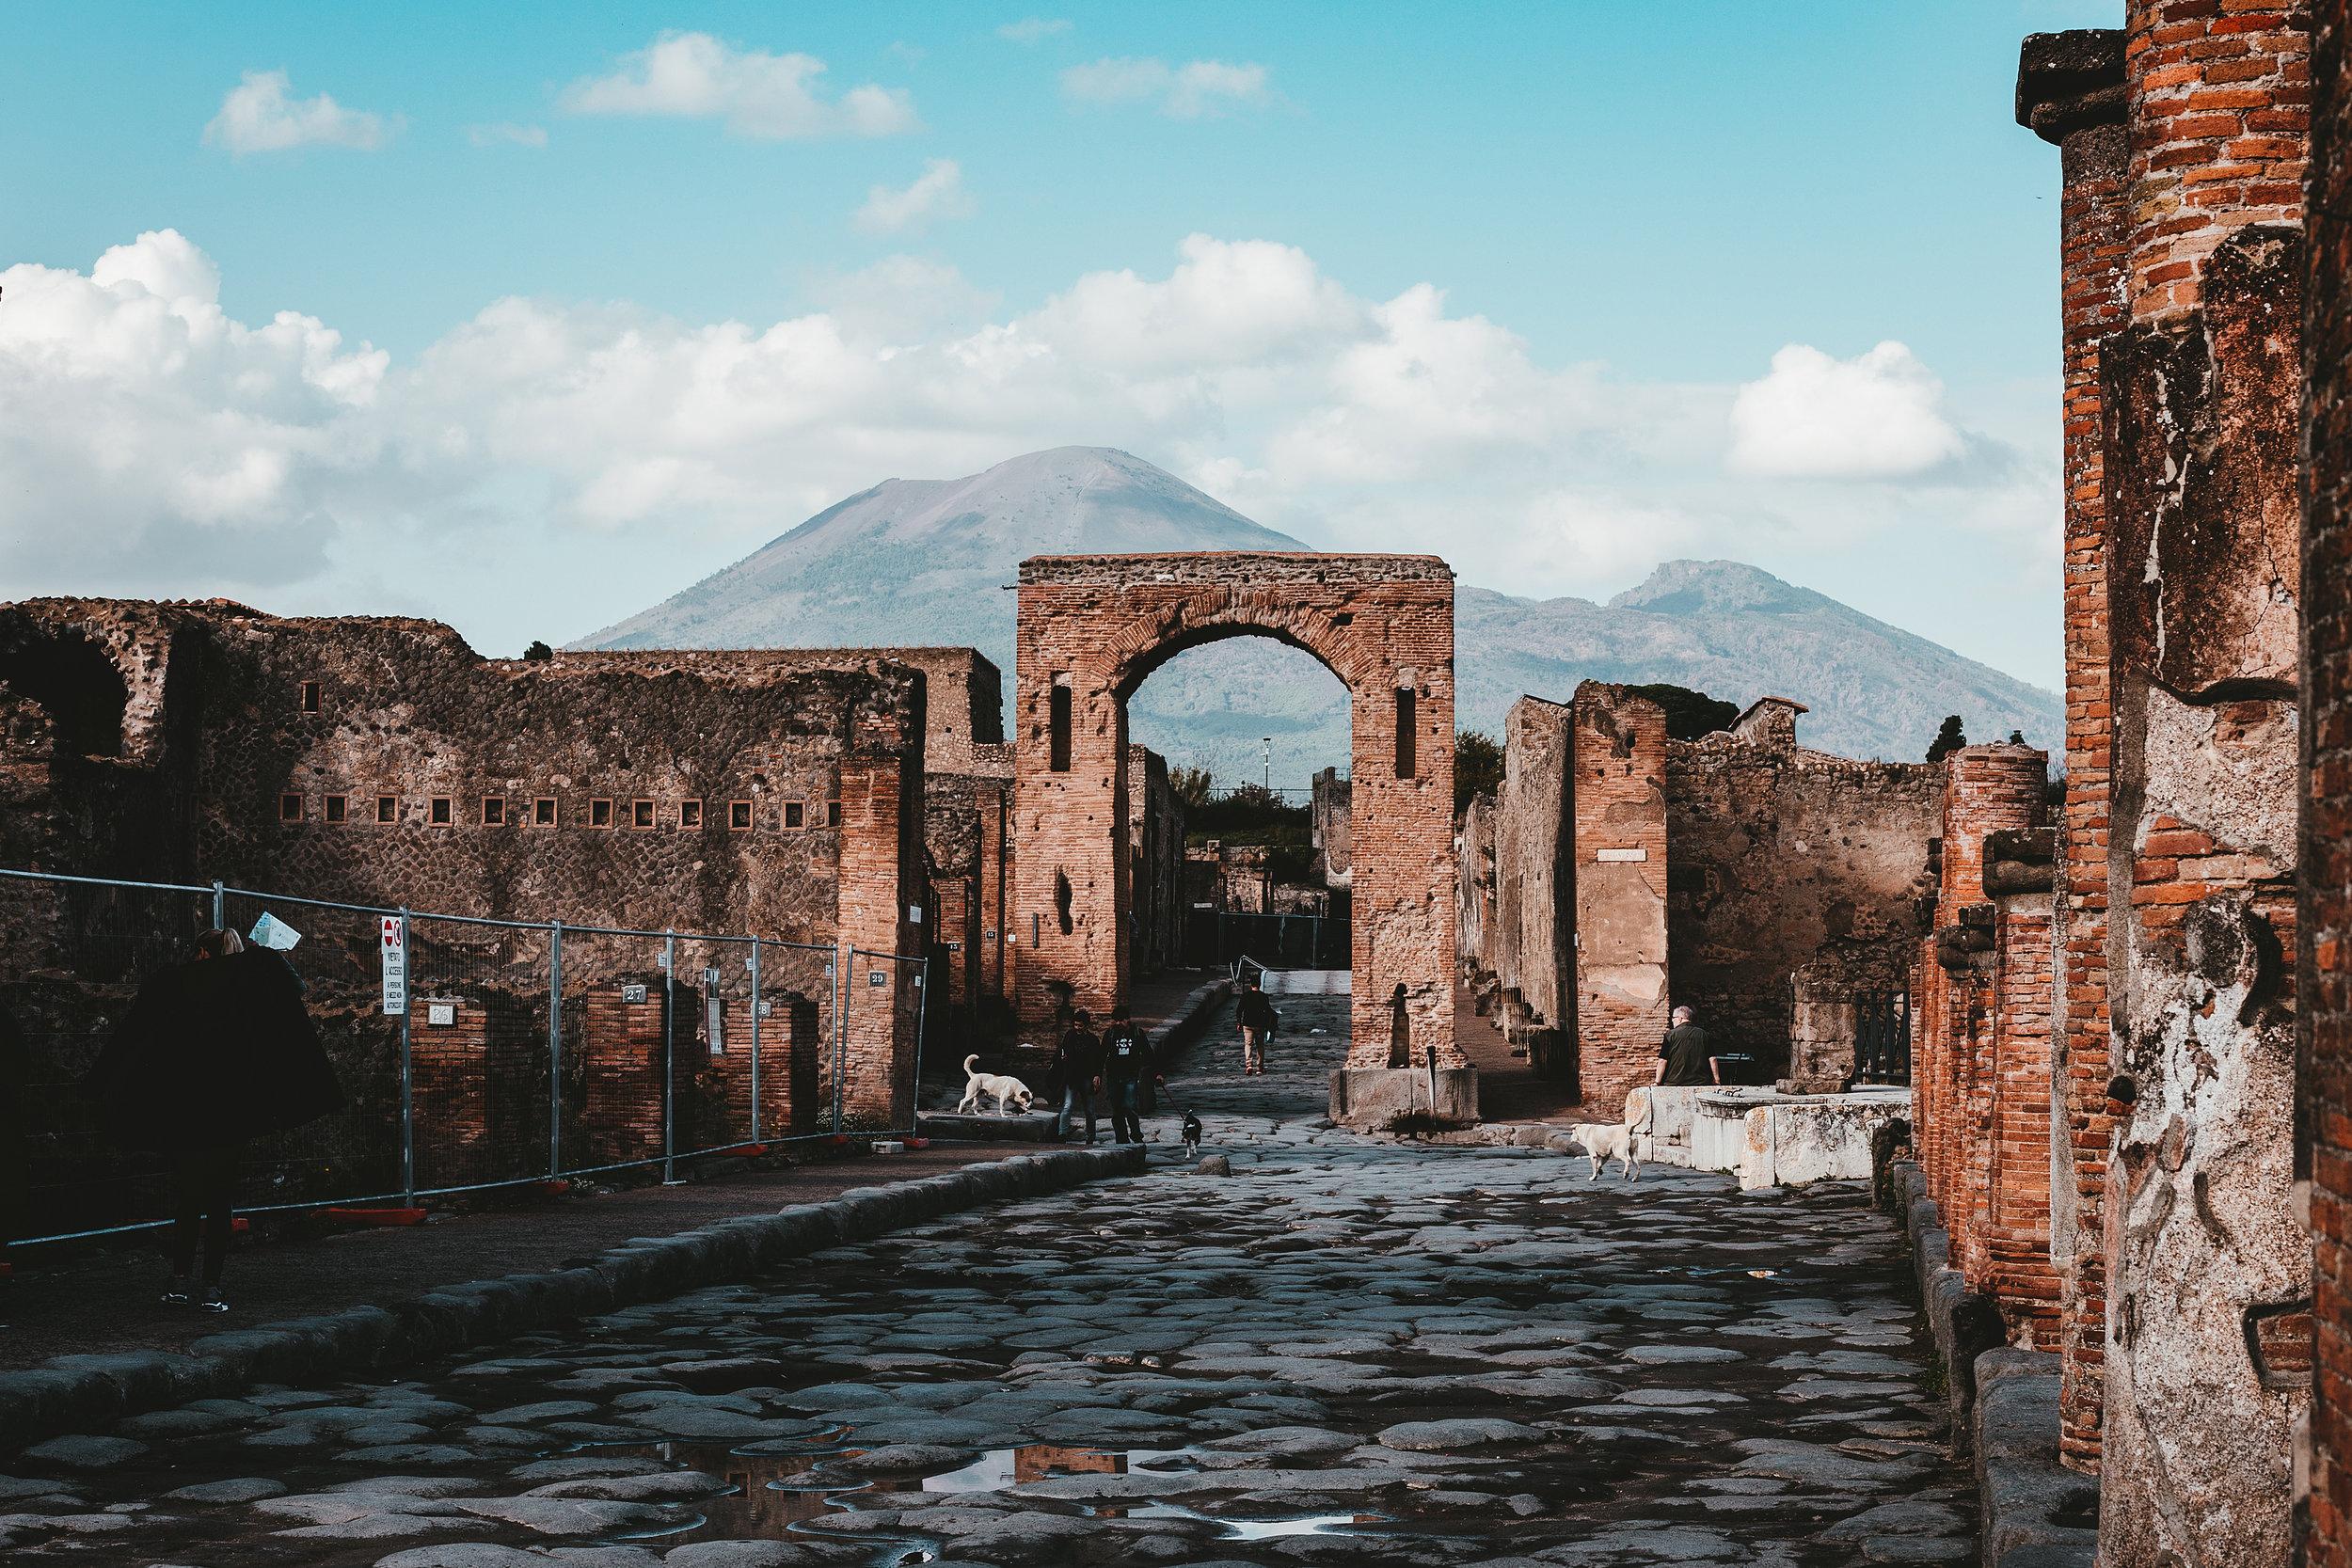 Pompeii, in the shadow of Mt. Vesuvius